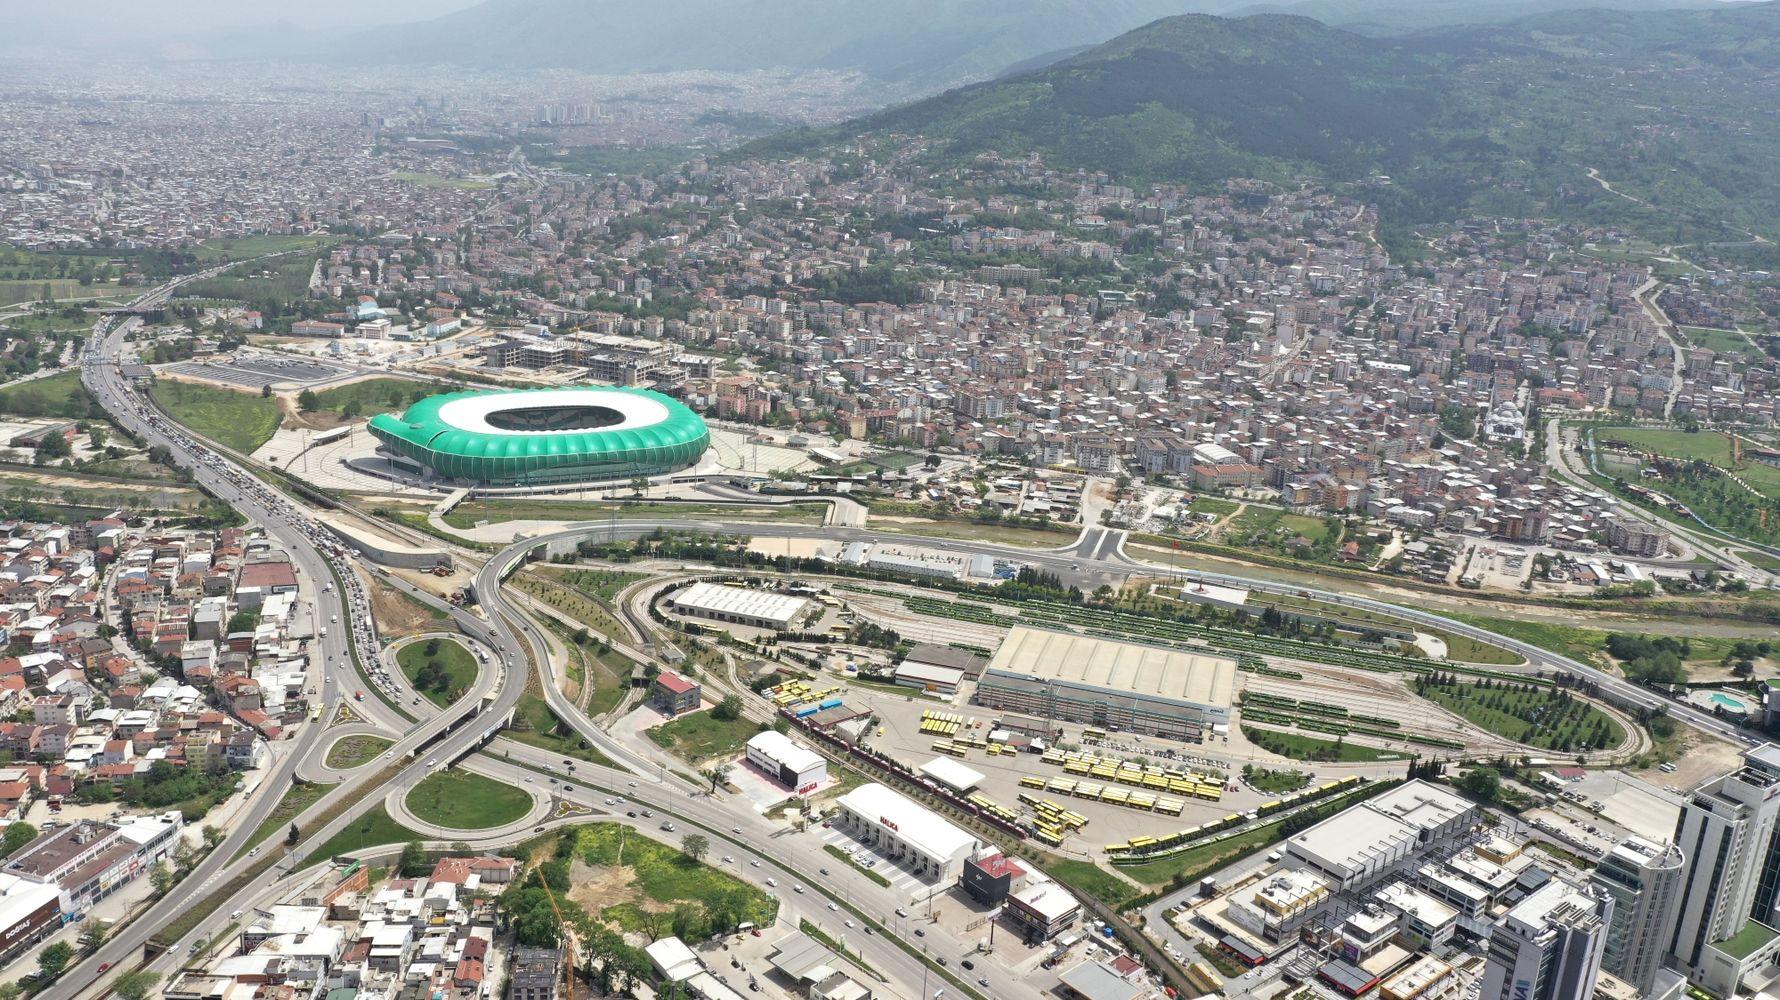 the burden of the Bursa novice crossroads will be alleviated by the new bridge